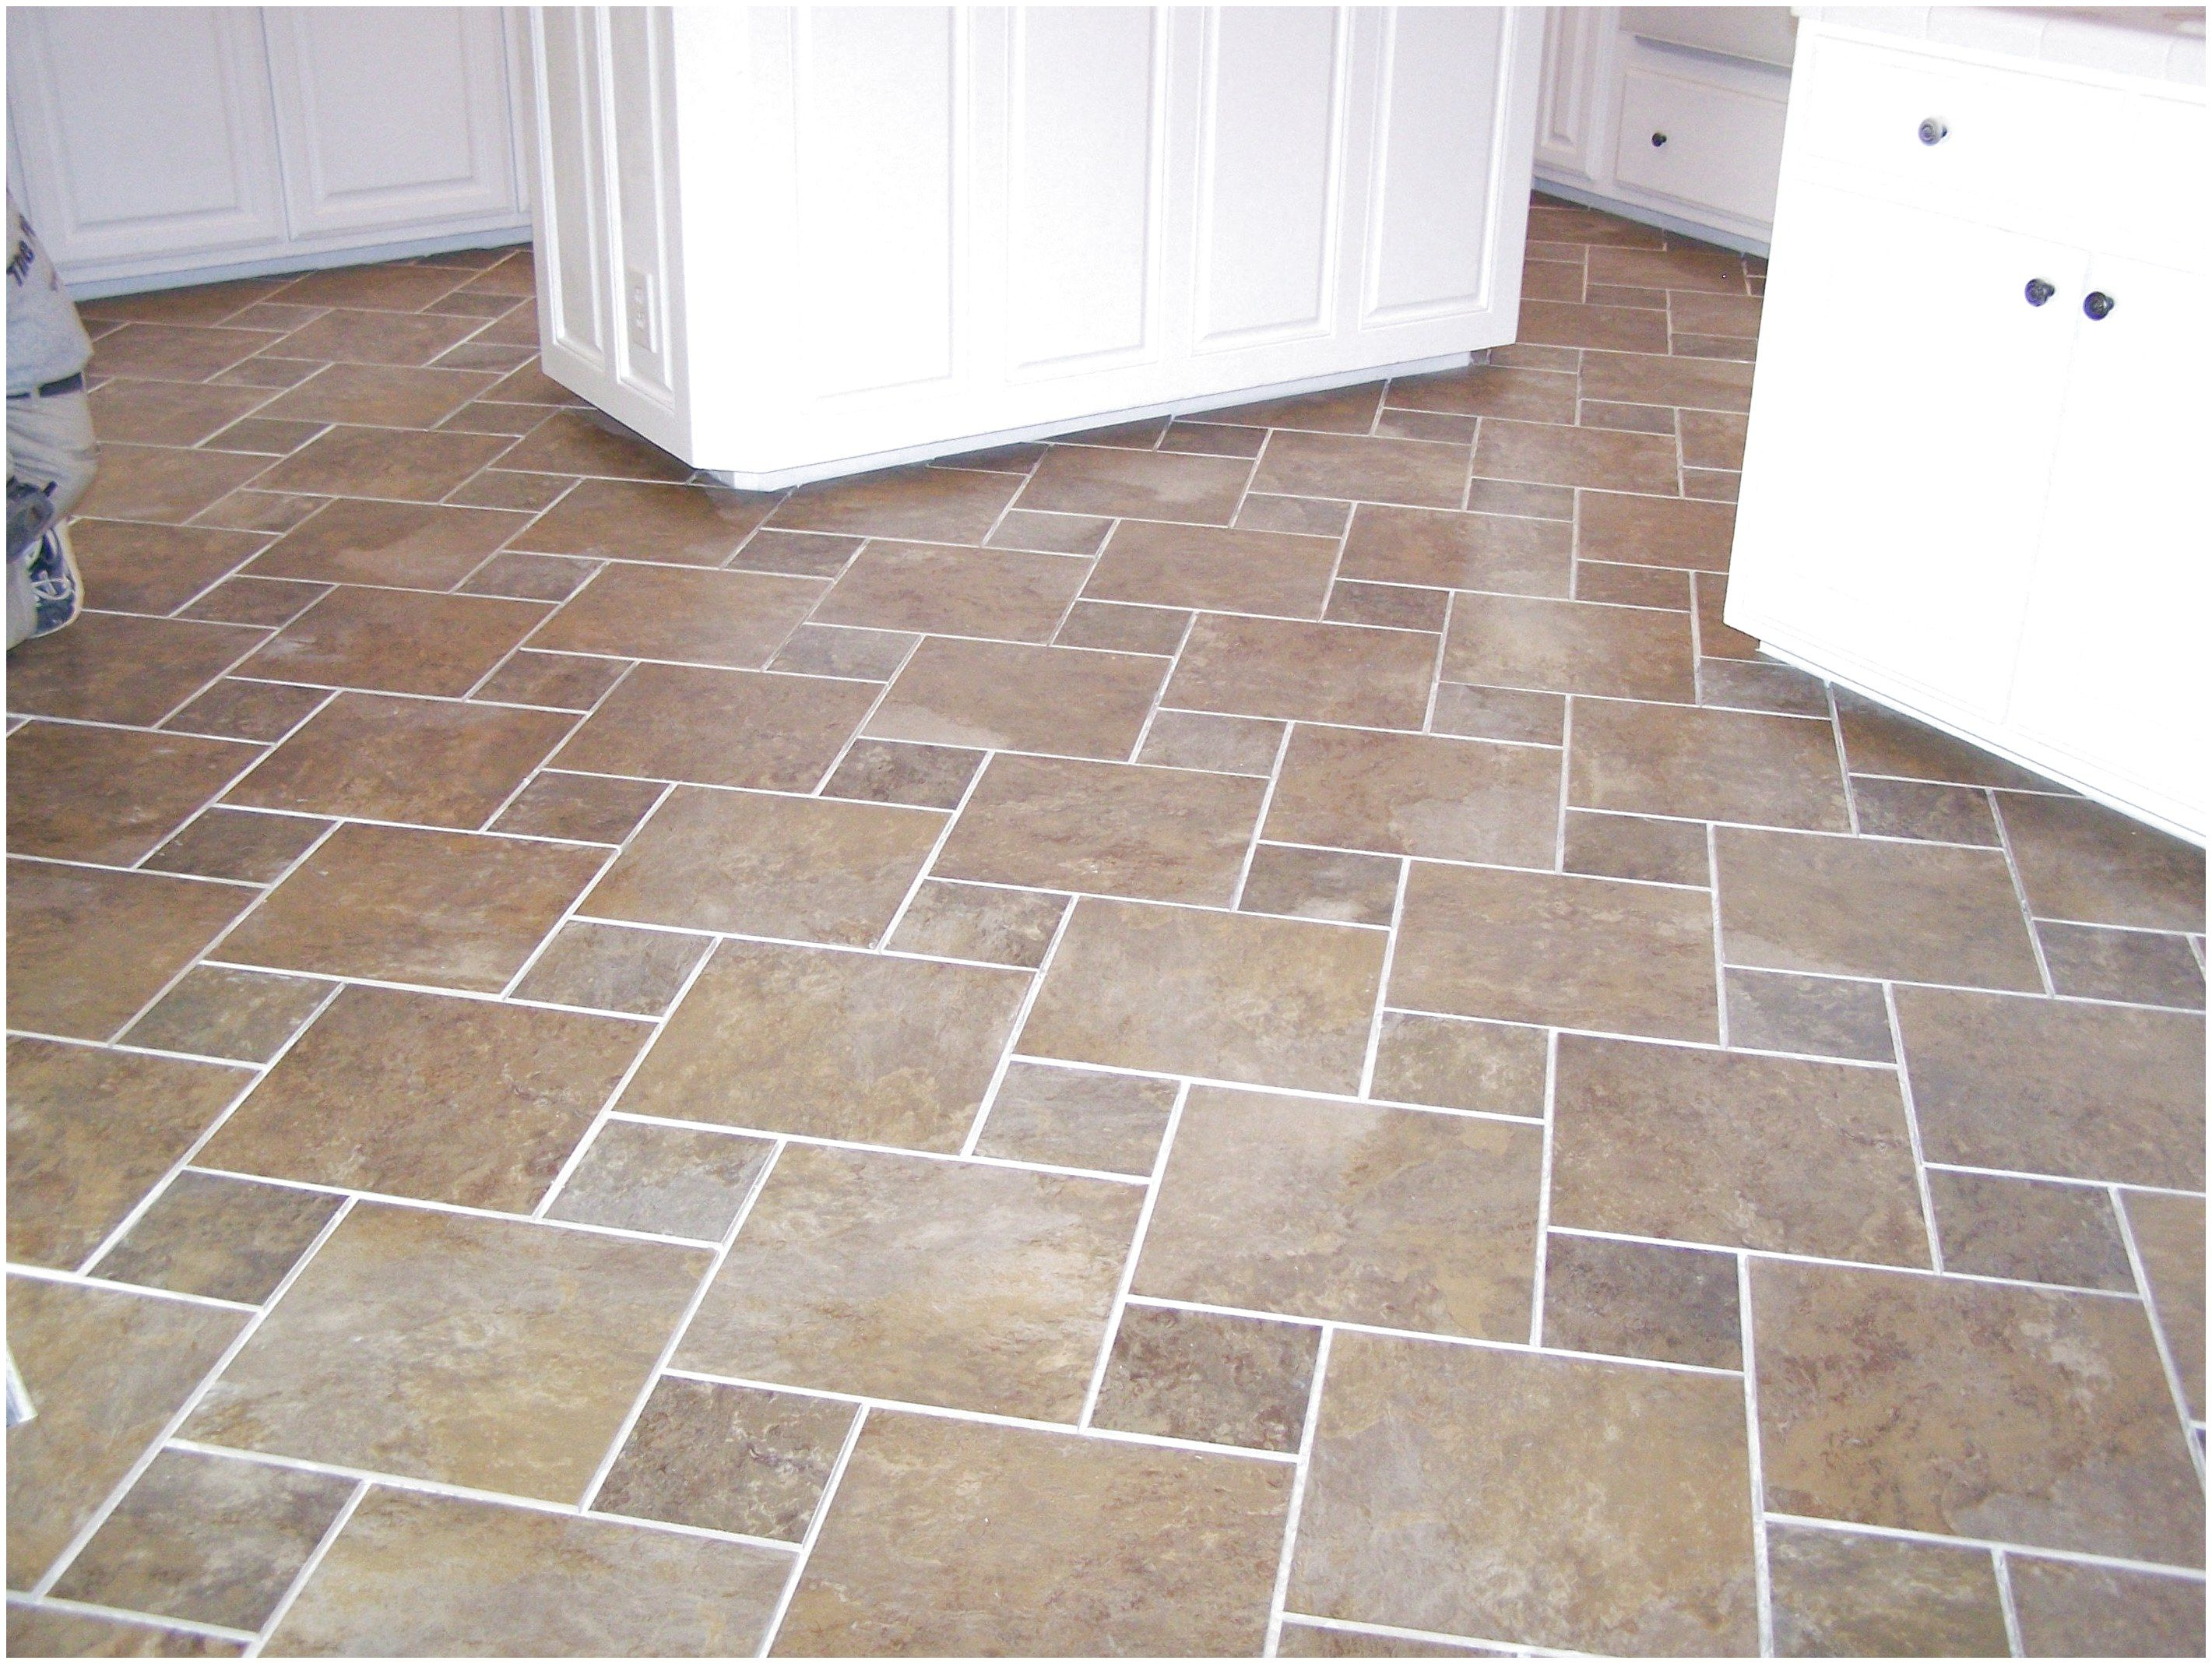 High resolution image home design ideas floor tile patterns 2832x2128 ceramic tile flooring home designing lowes tile flooring floor til